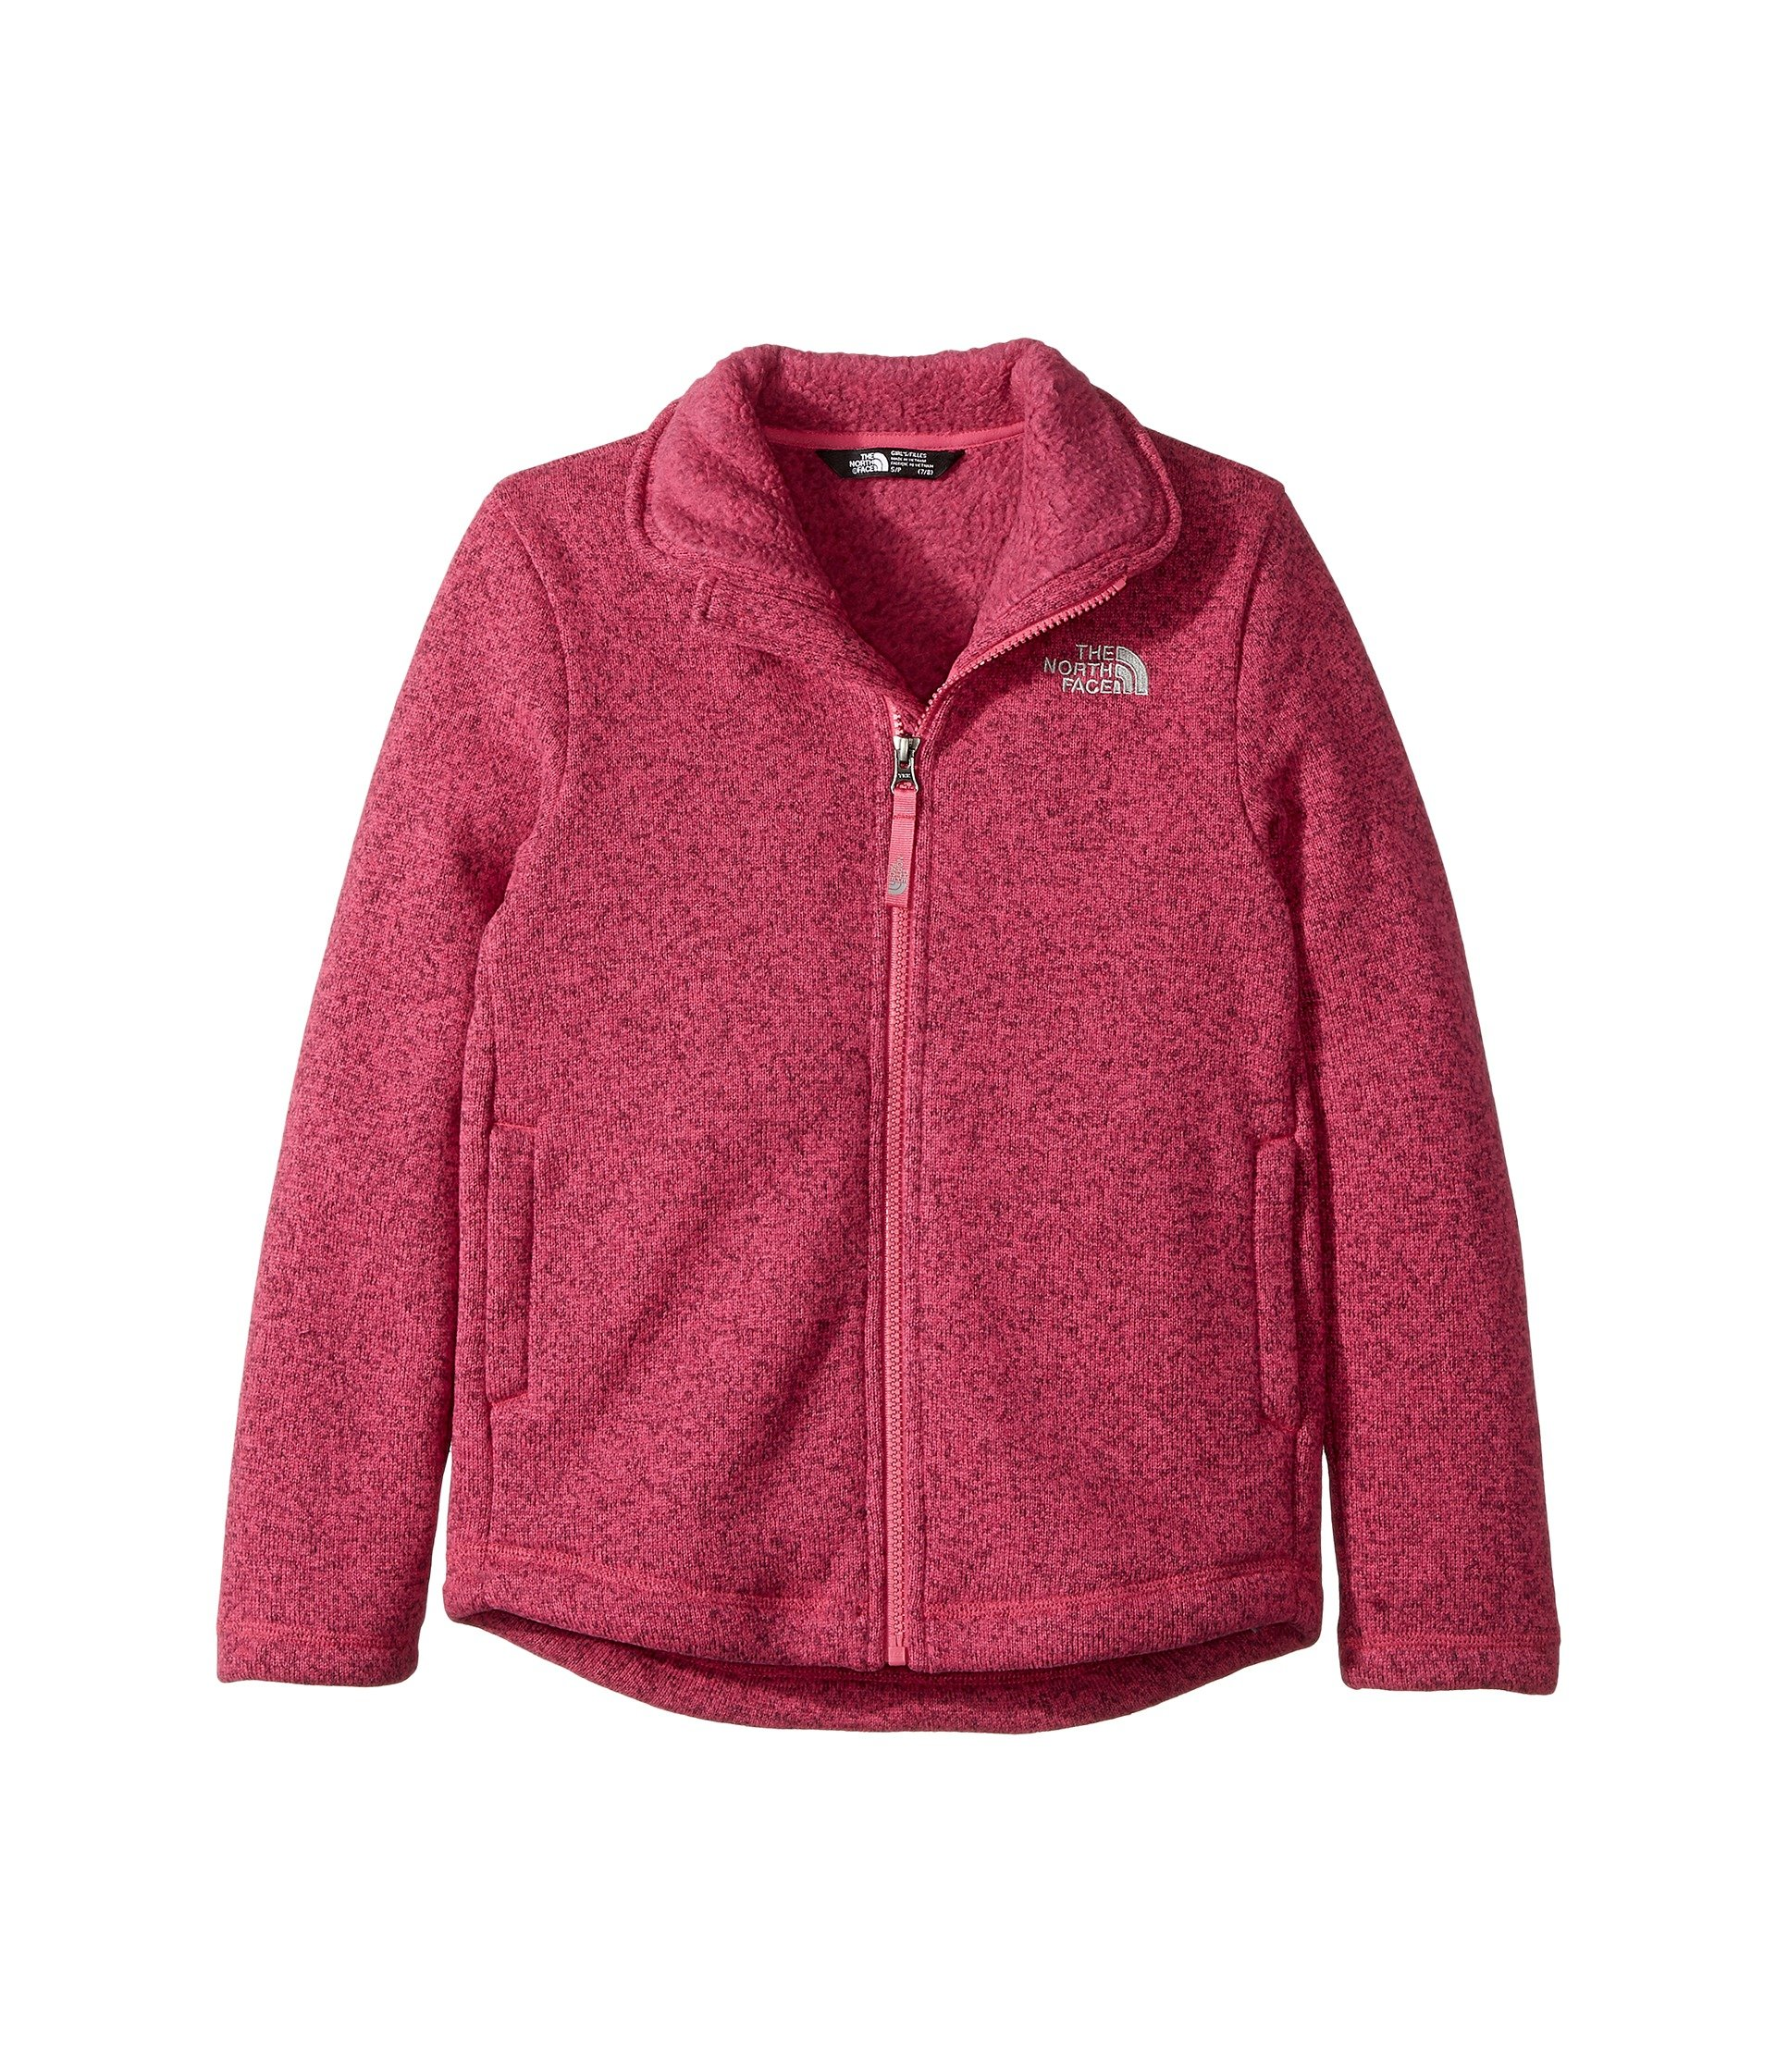 The North Face Kids Crescent Full Zip Little Kids/Big Kids Petticoat Pink Heather Girl's Coat